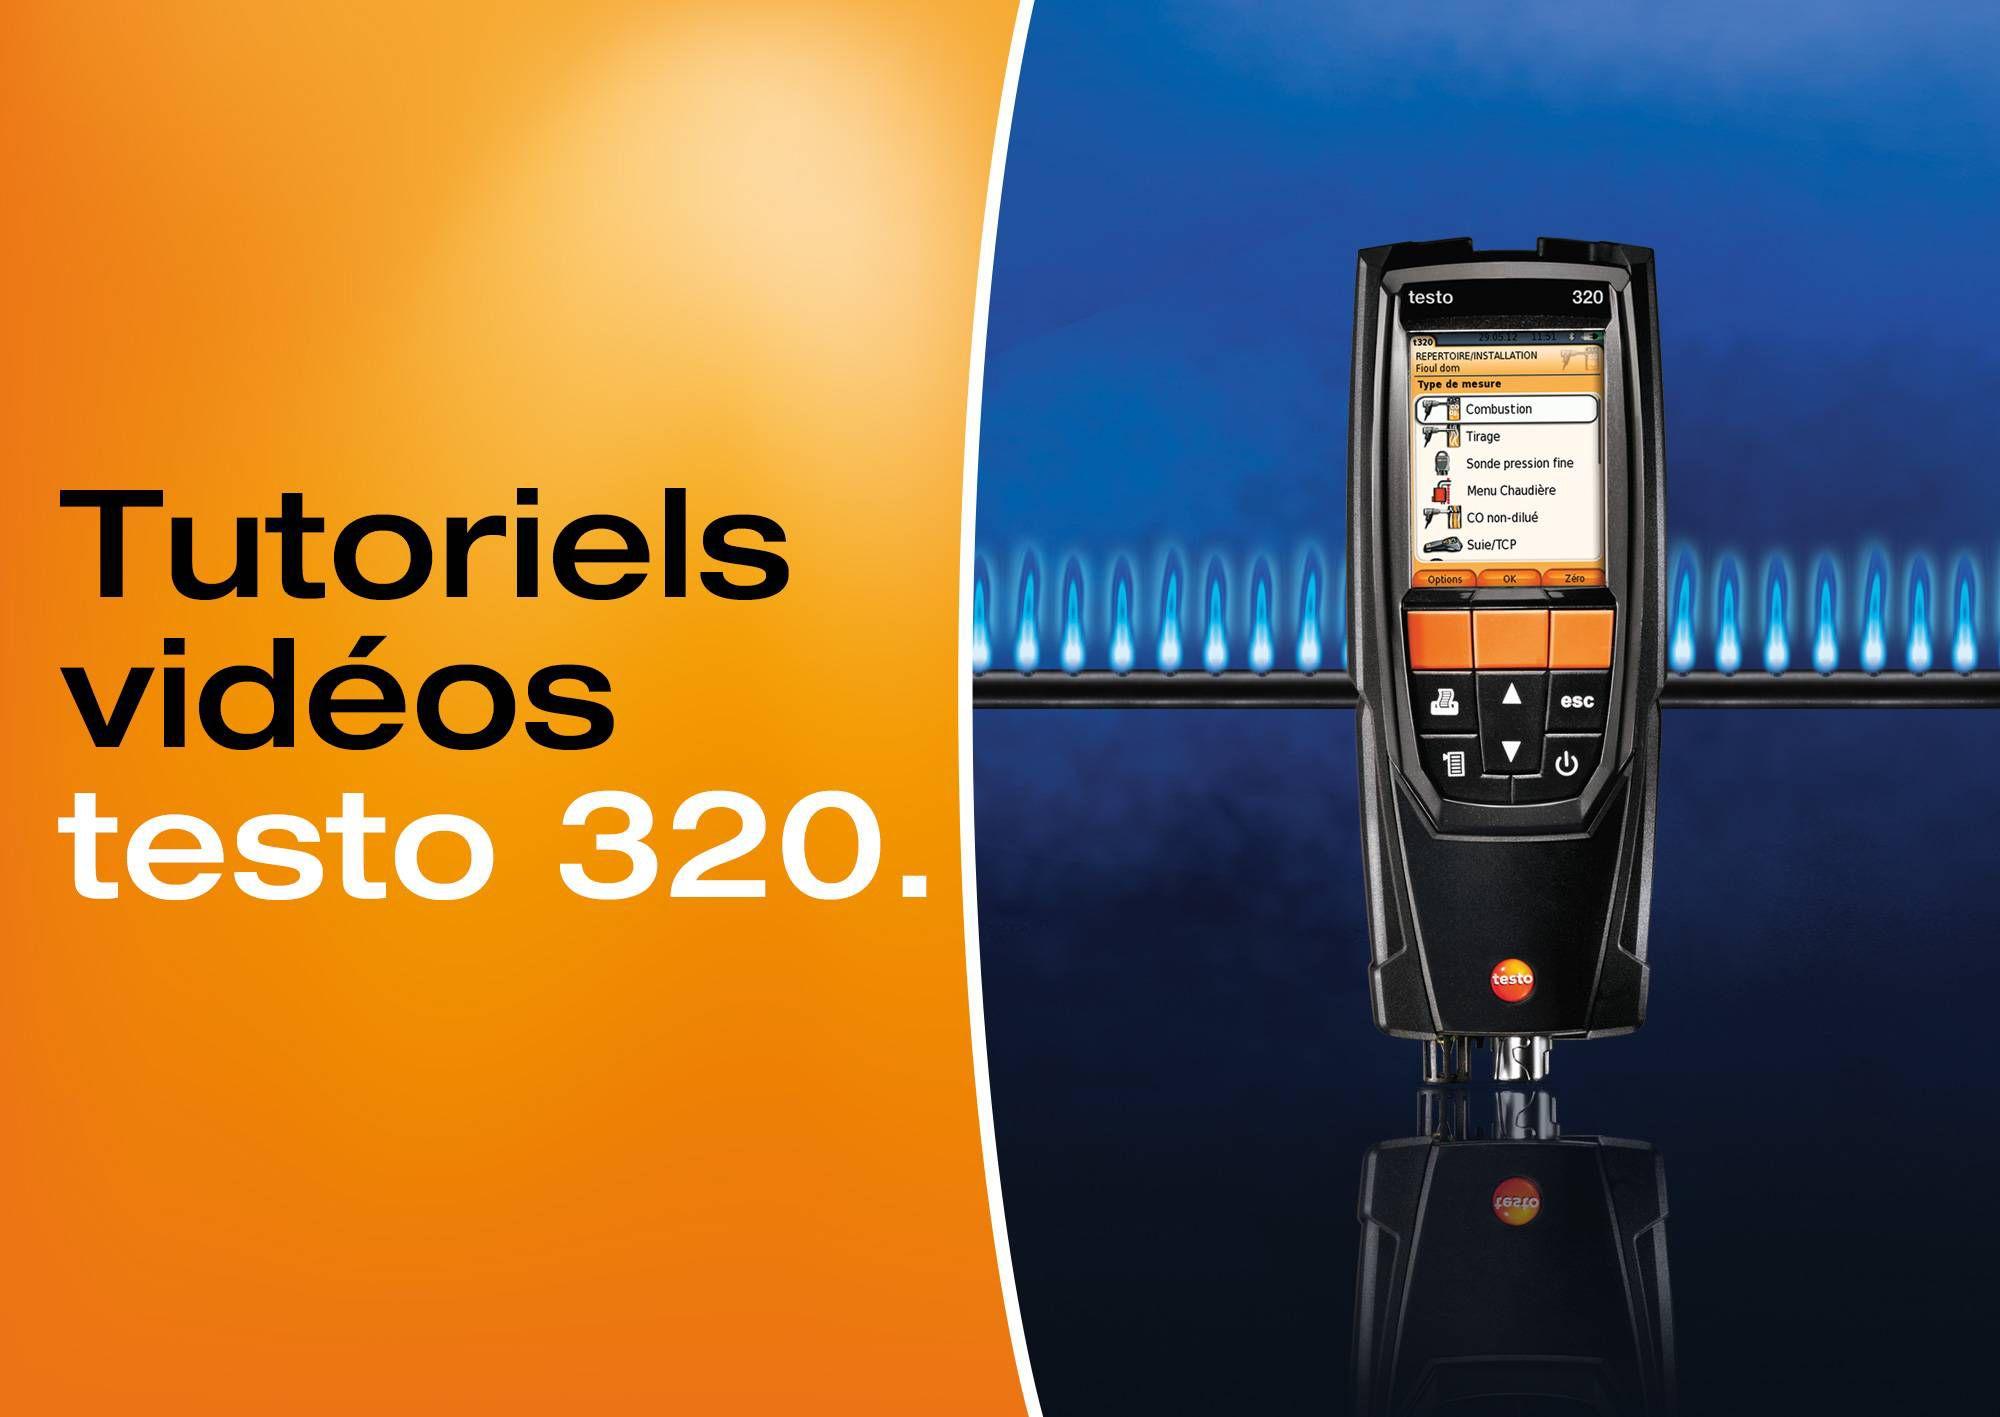 tutoriels-vidéos-analyseur-testo-320